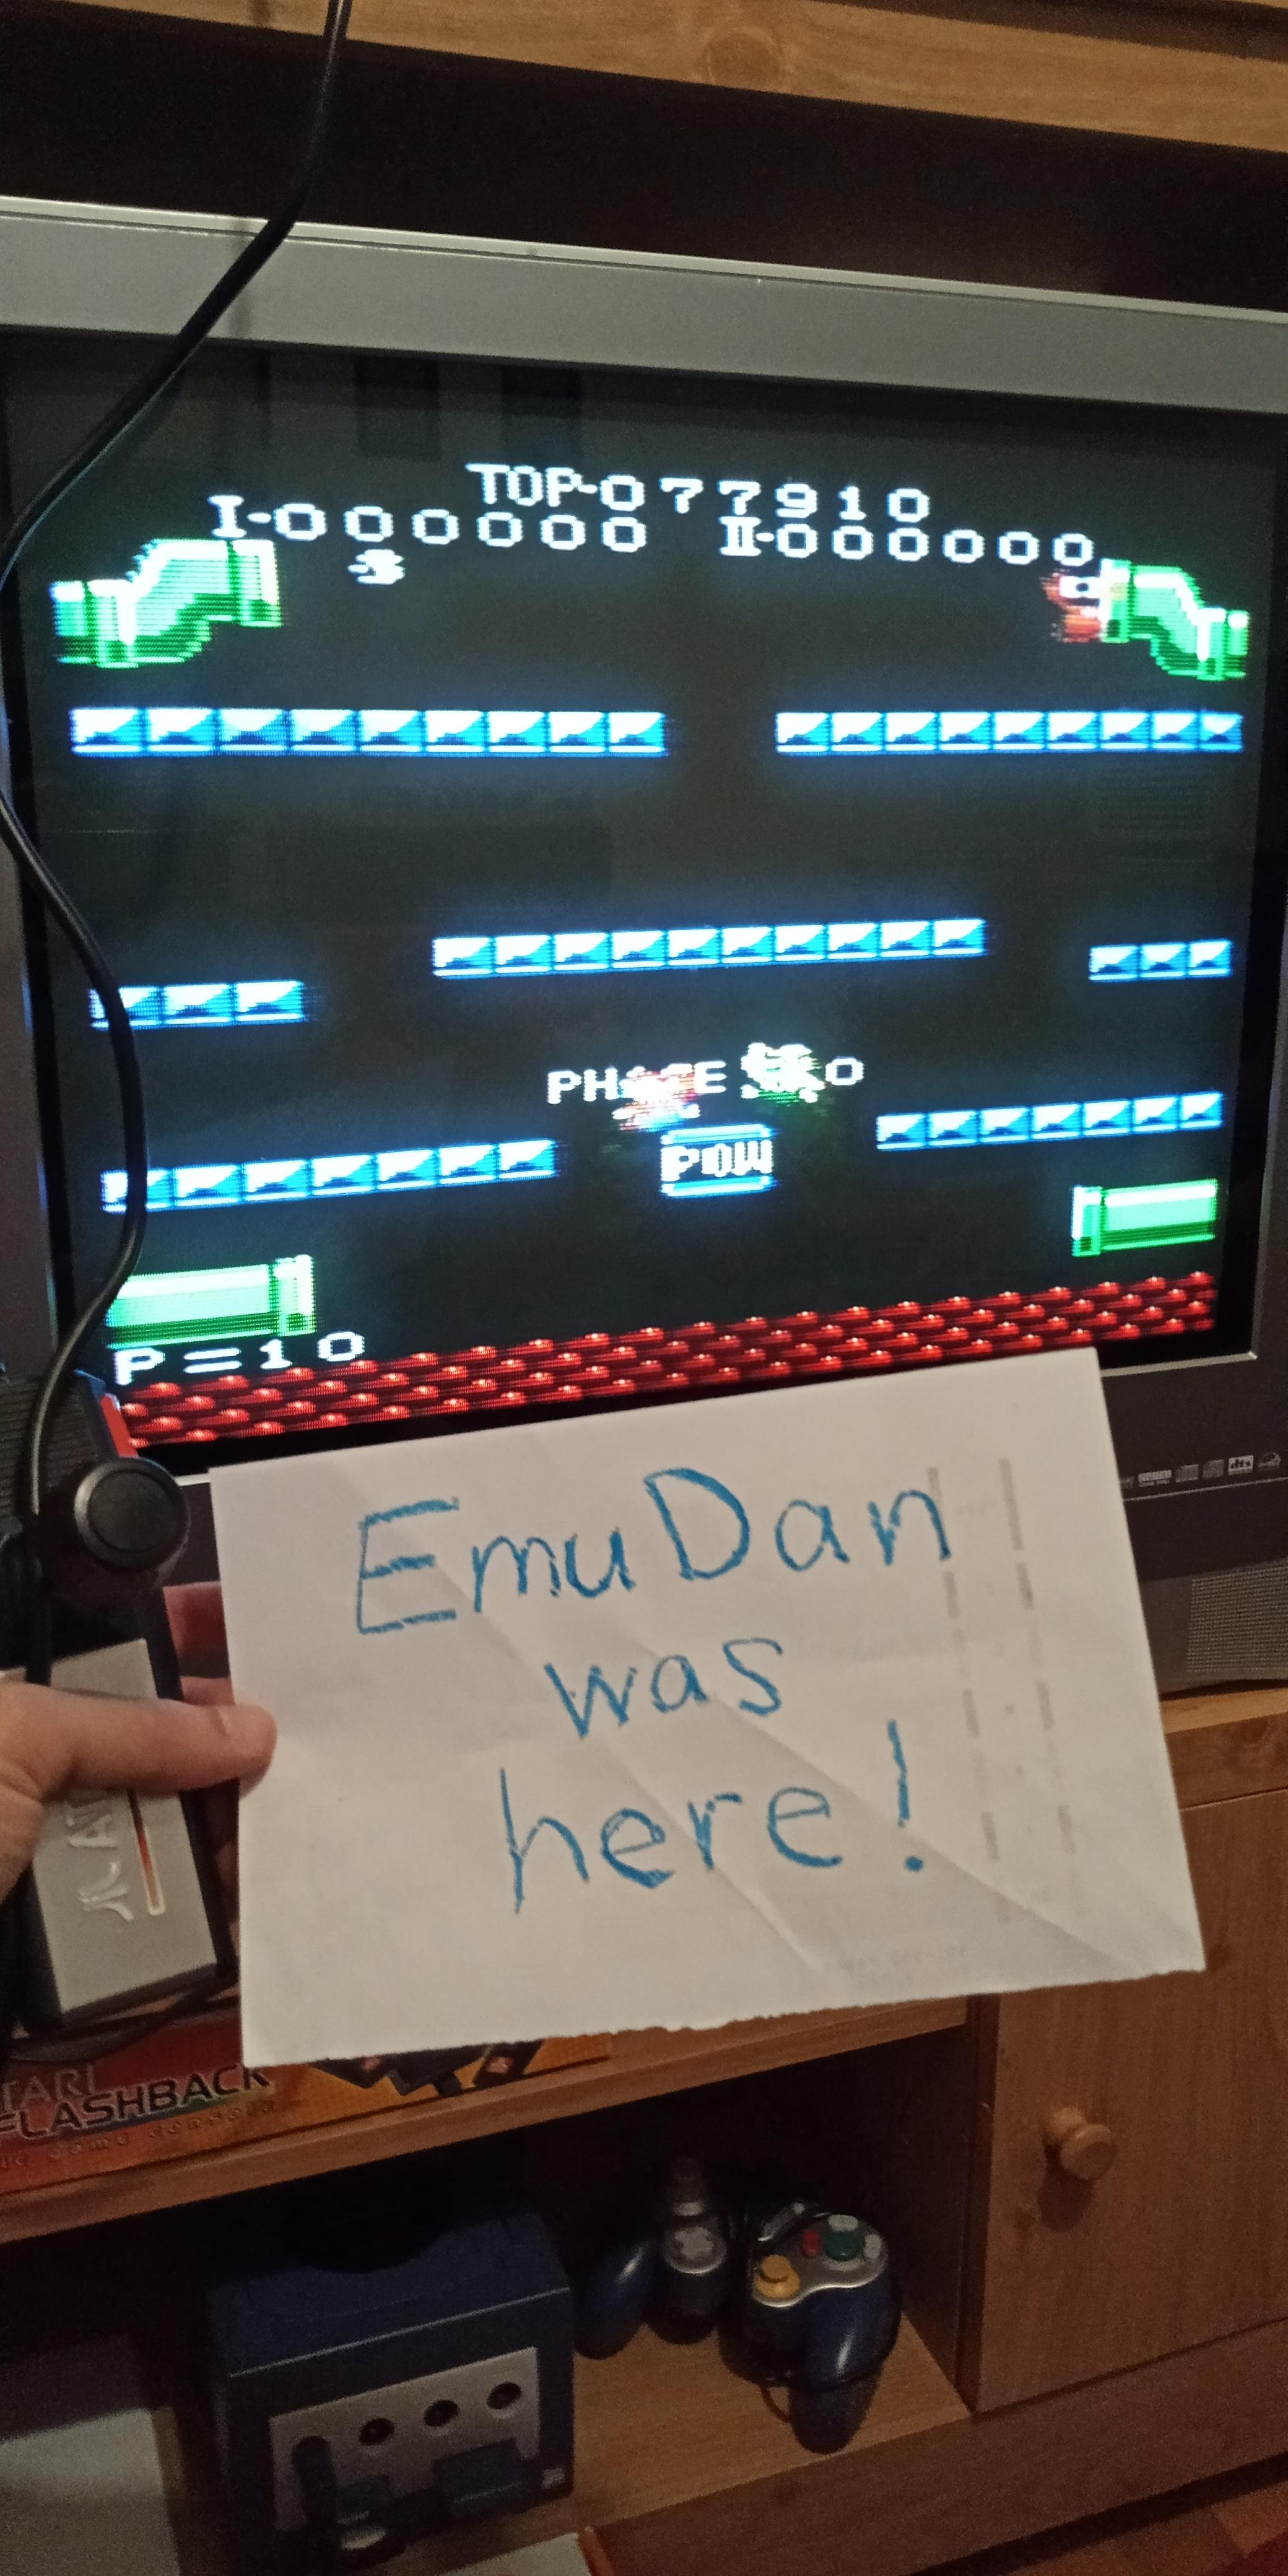 EmuDan: Mario Bros. [Standard] (Atari 7800) 77,910 points on 2019-05-19 14:19:57